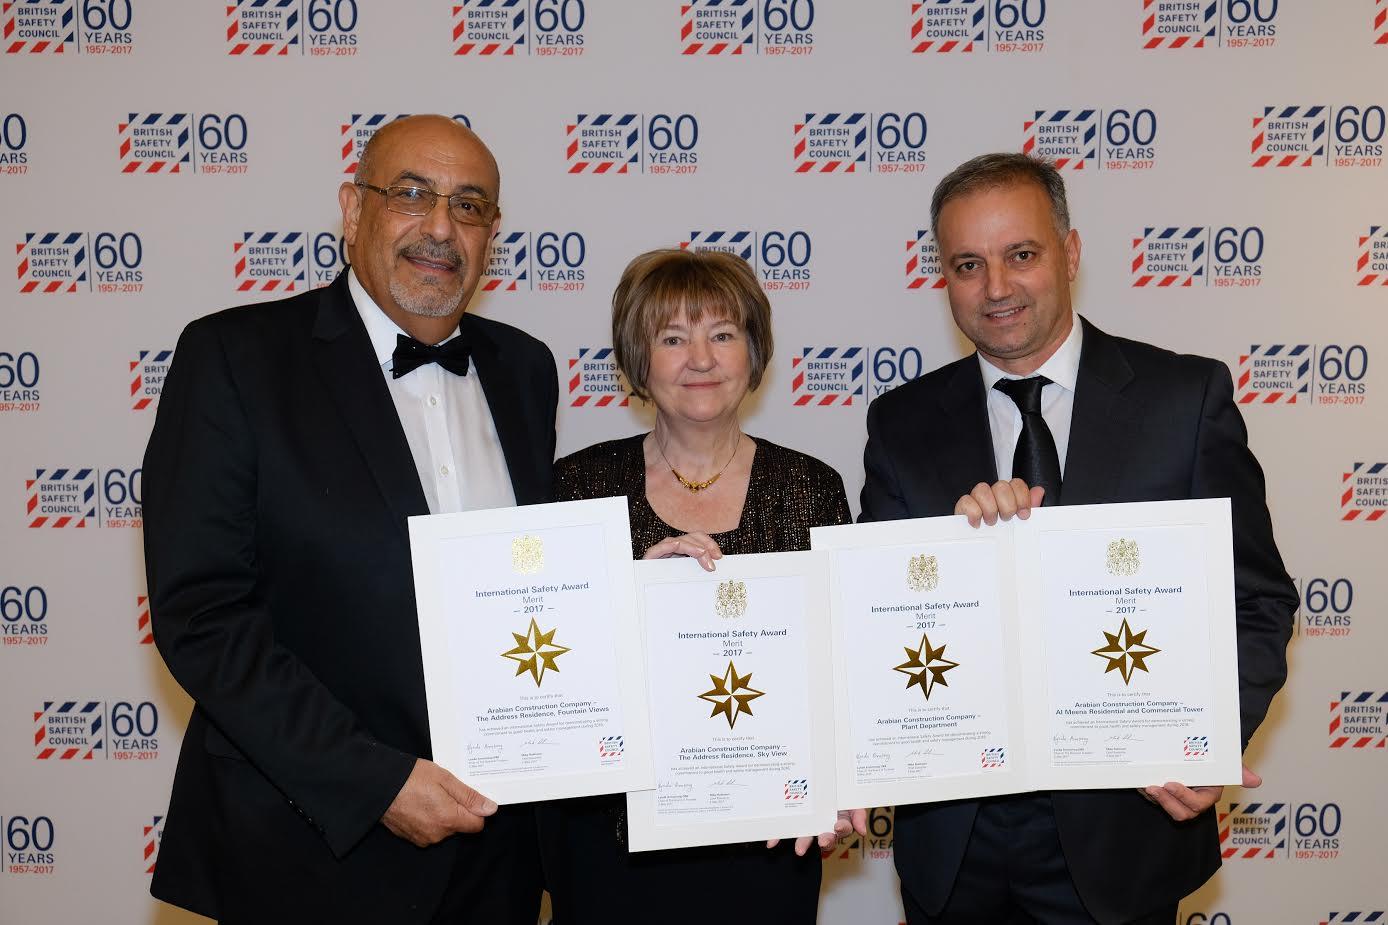 ACC (Arabian Construction Company) Wins International Safety